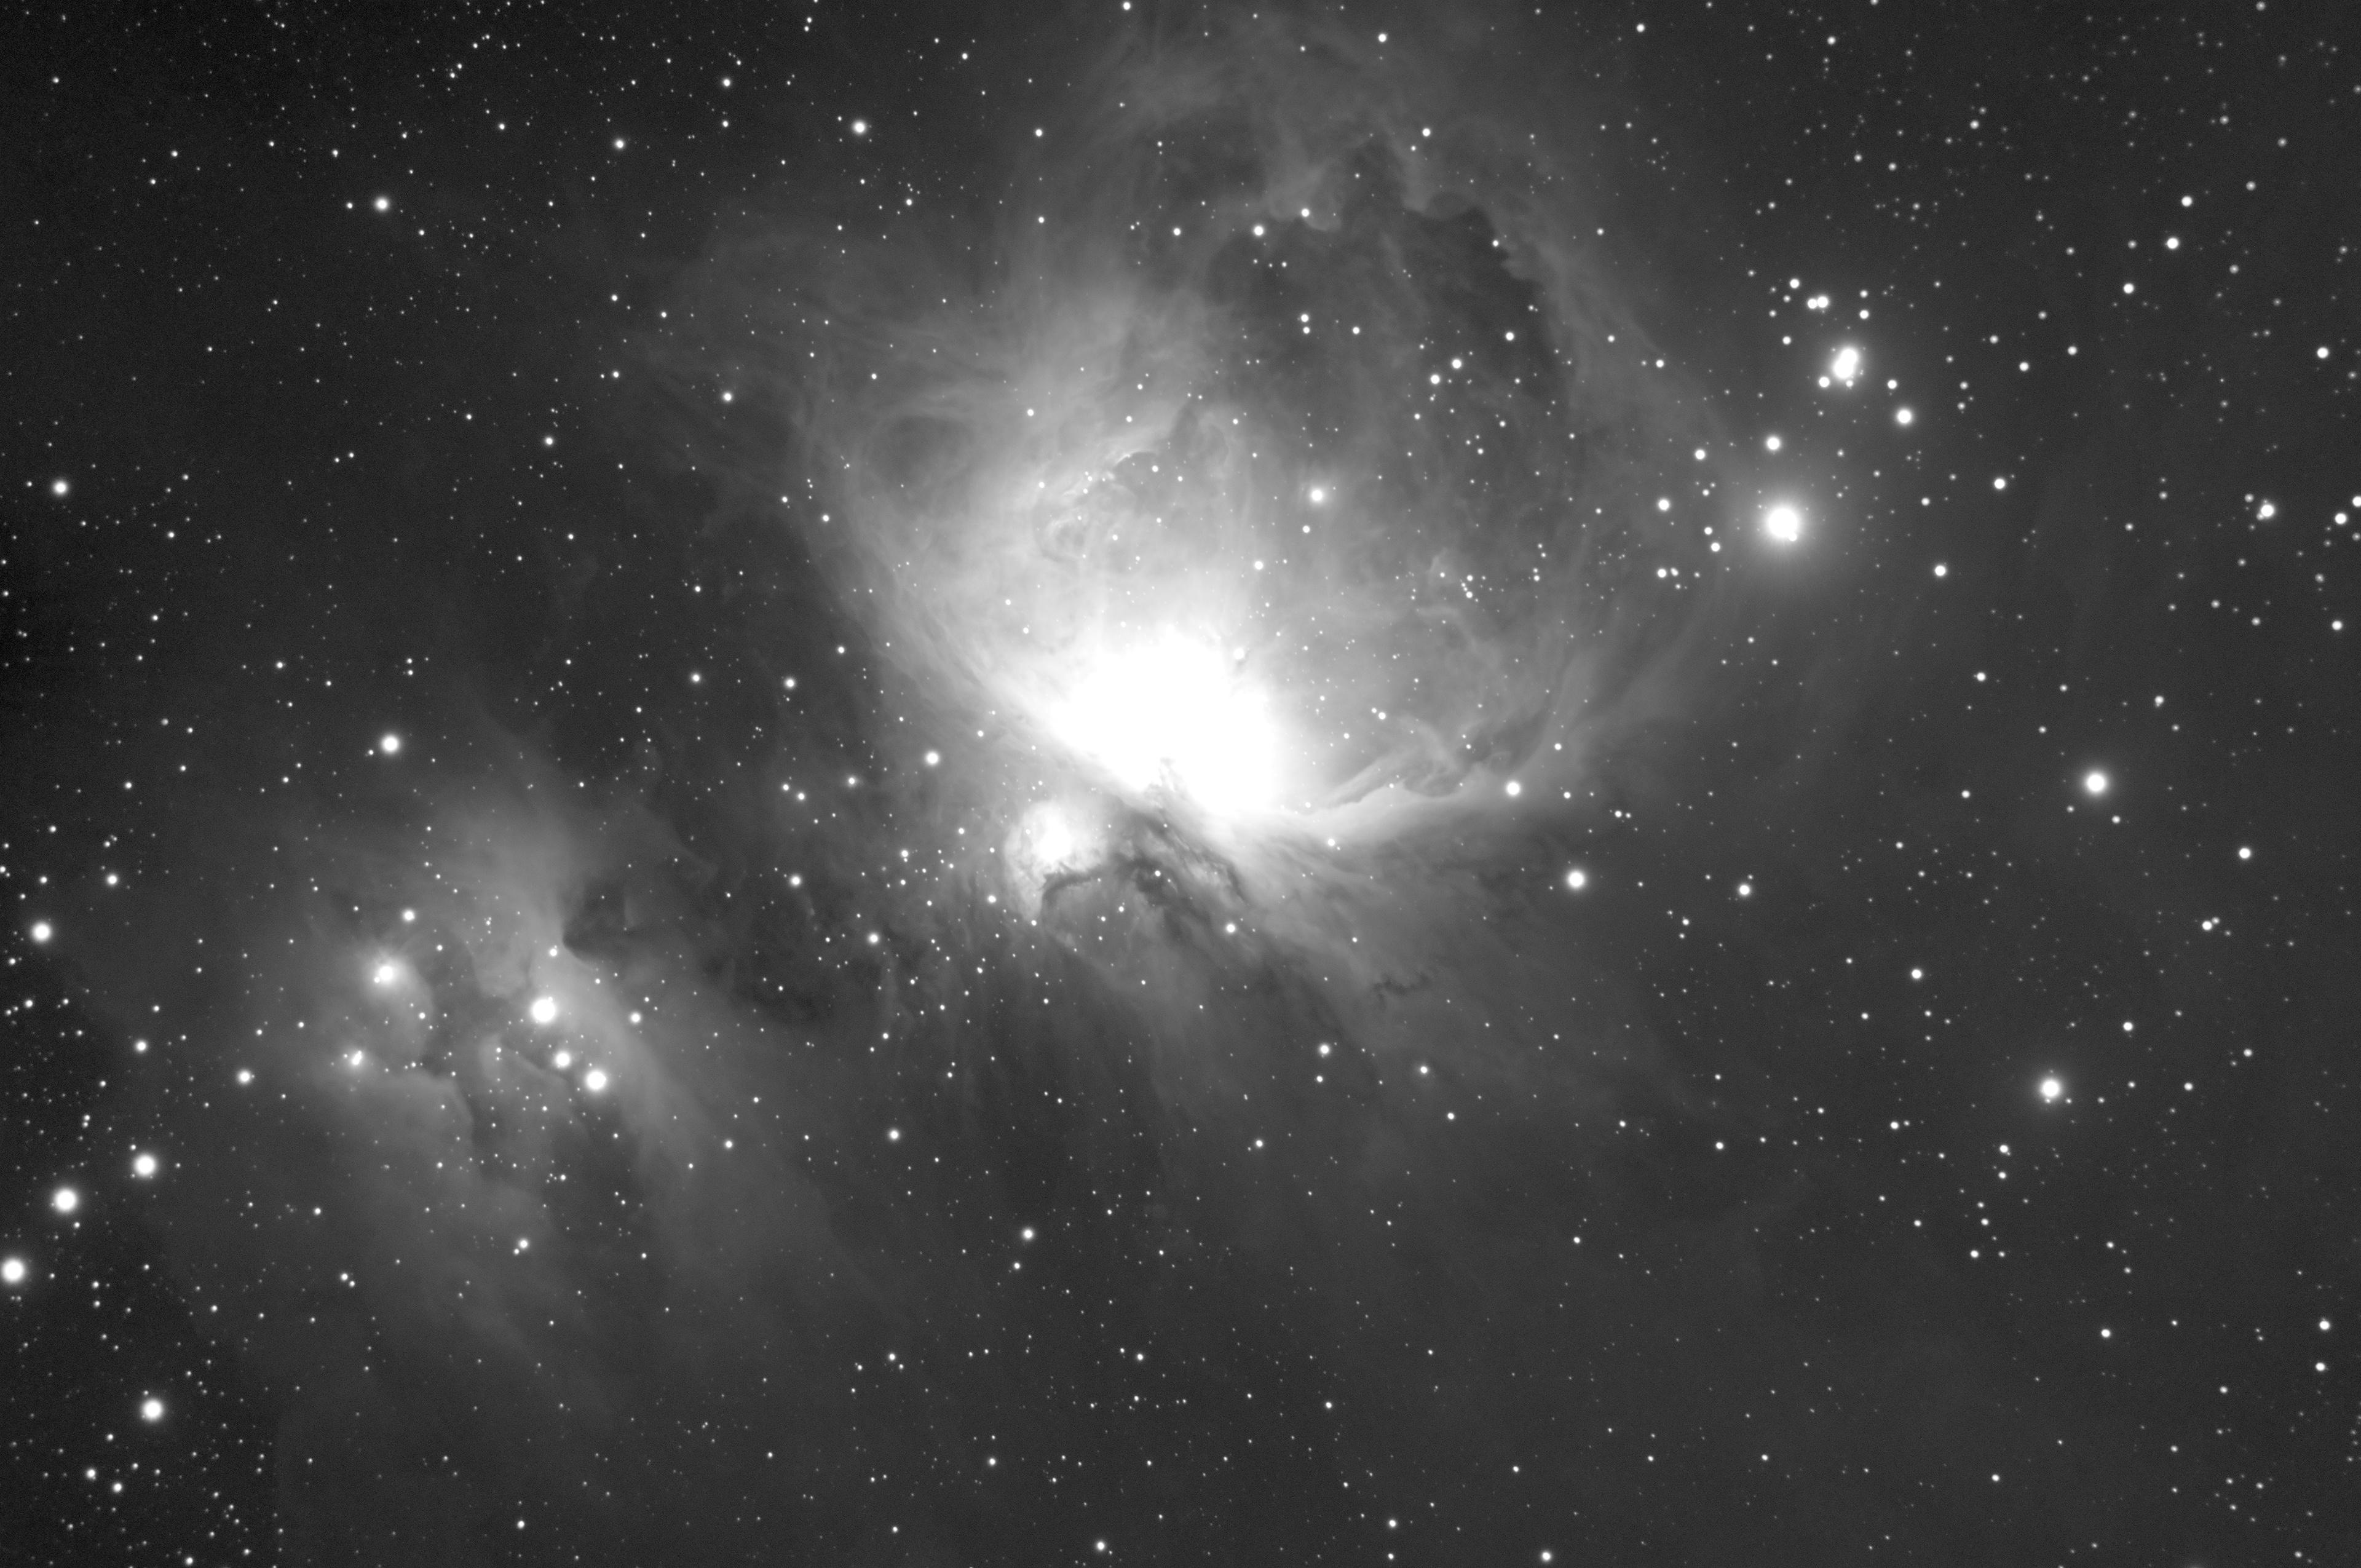 M42_7x90s_gain25.jpg